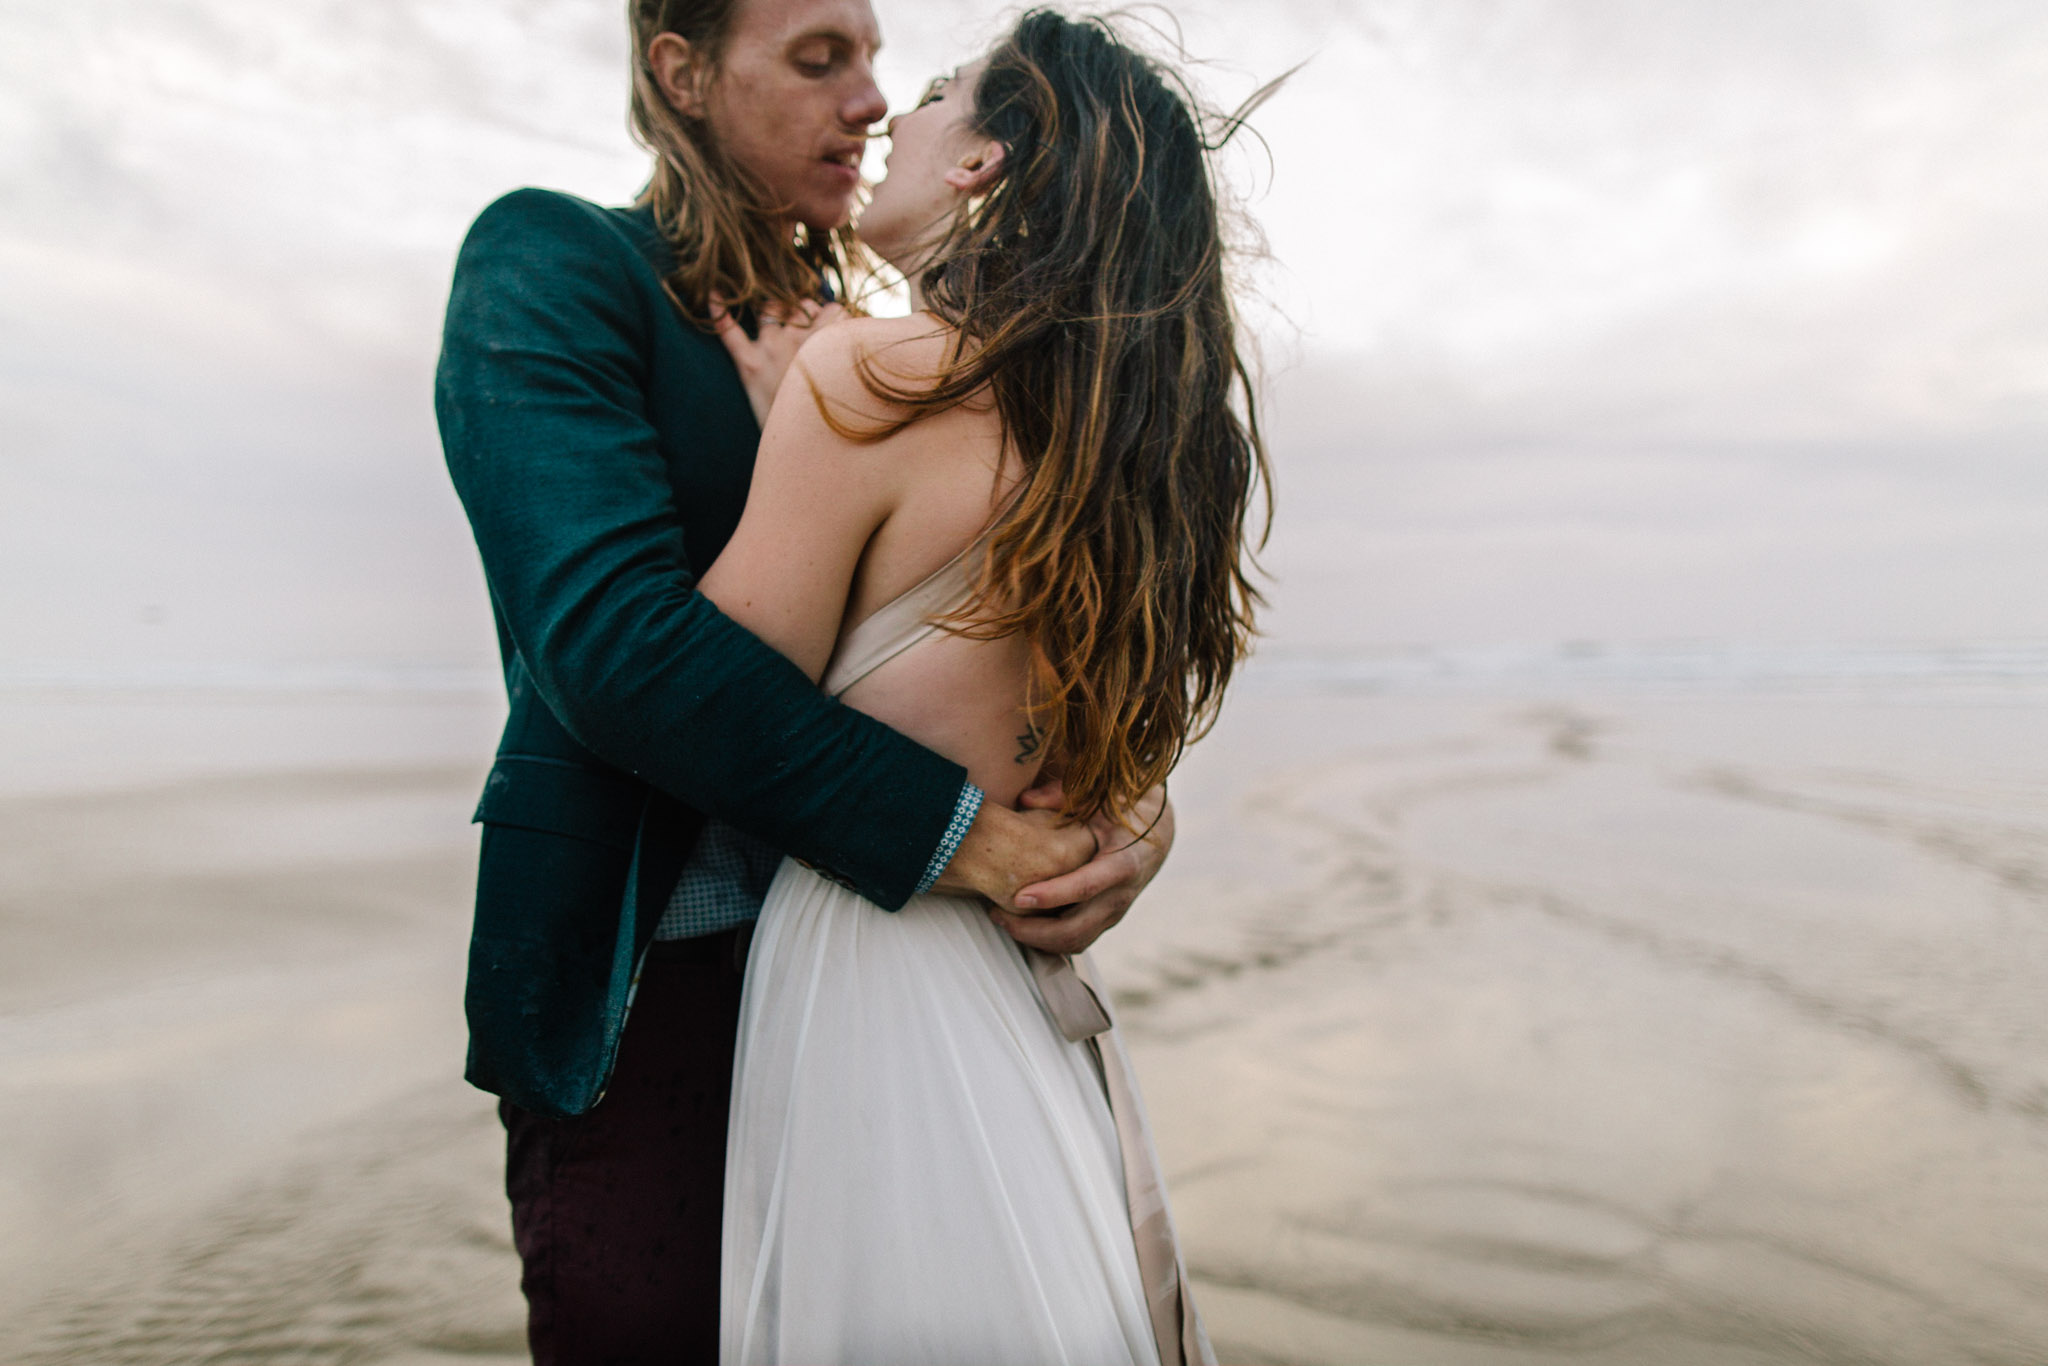 Oregon-Coast-Manzanita-Beach-Engagement-Pia-Anna-Christian-Wedding-Photography-PNW-GB-37.jpg